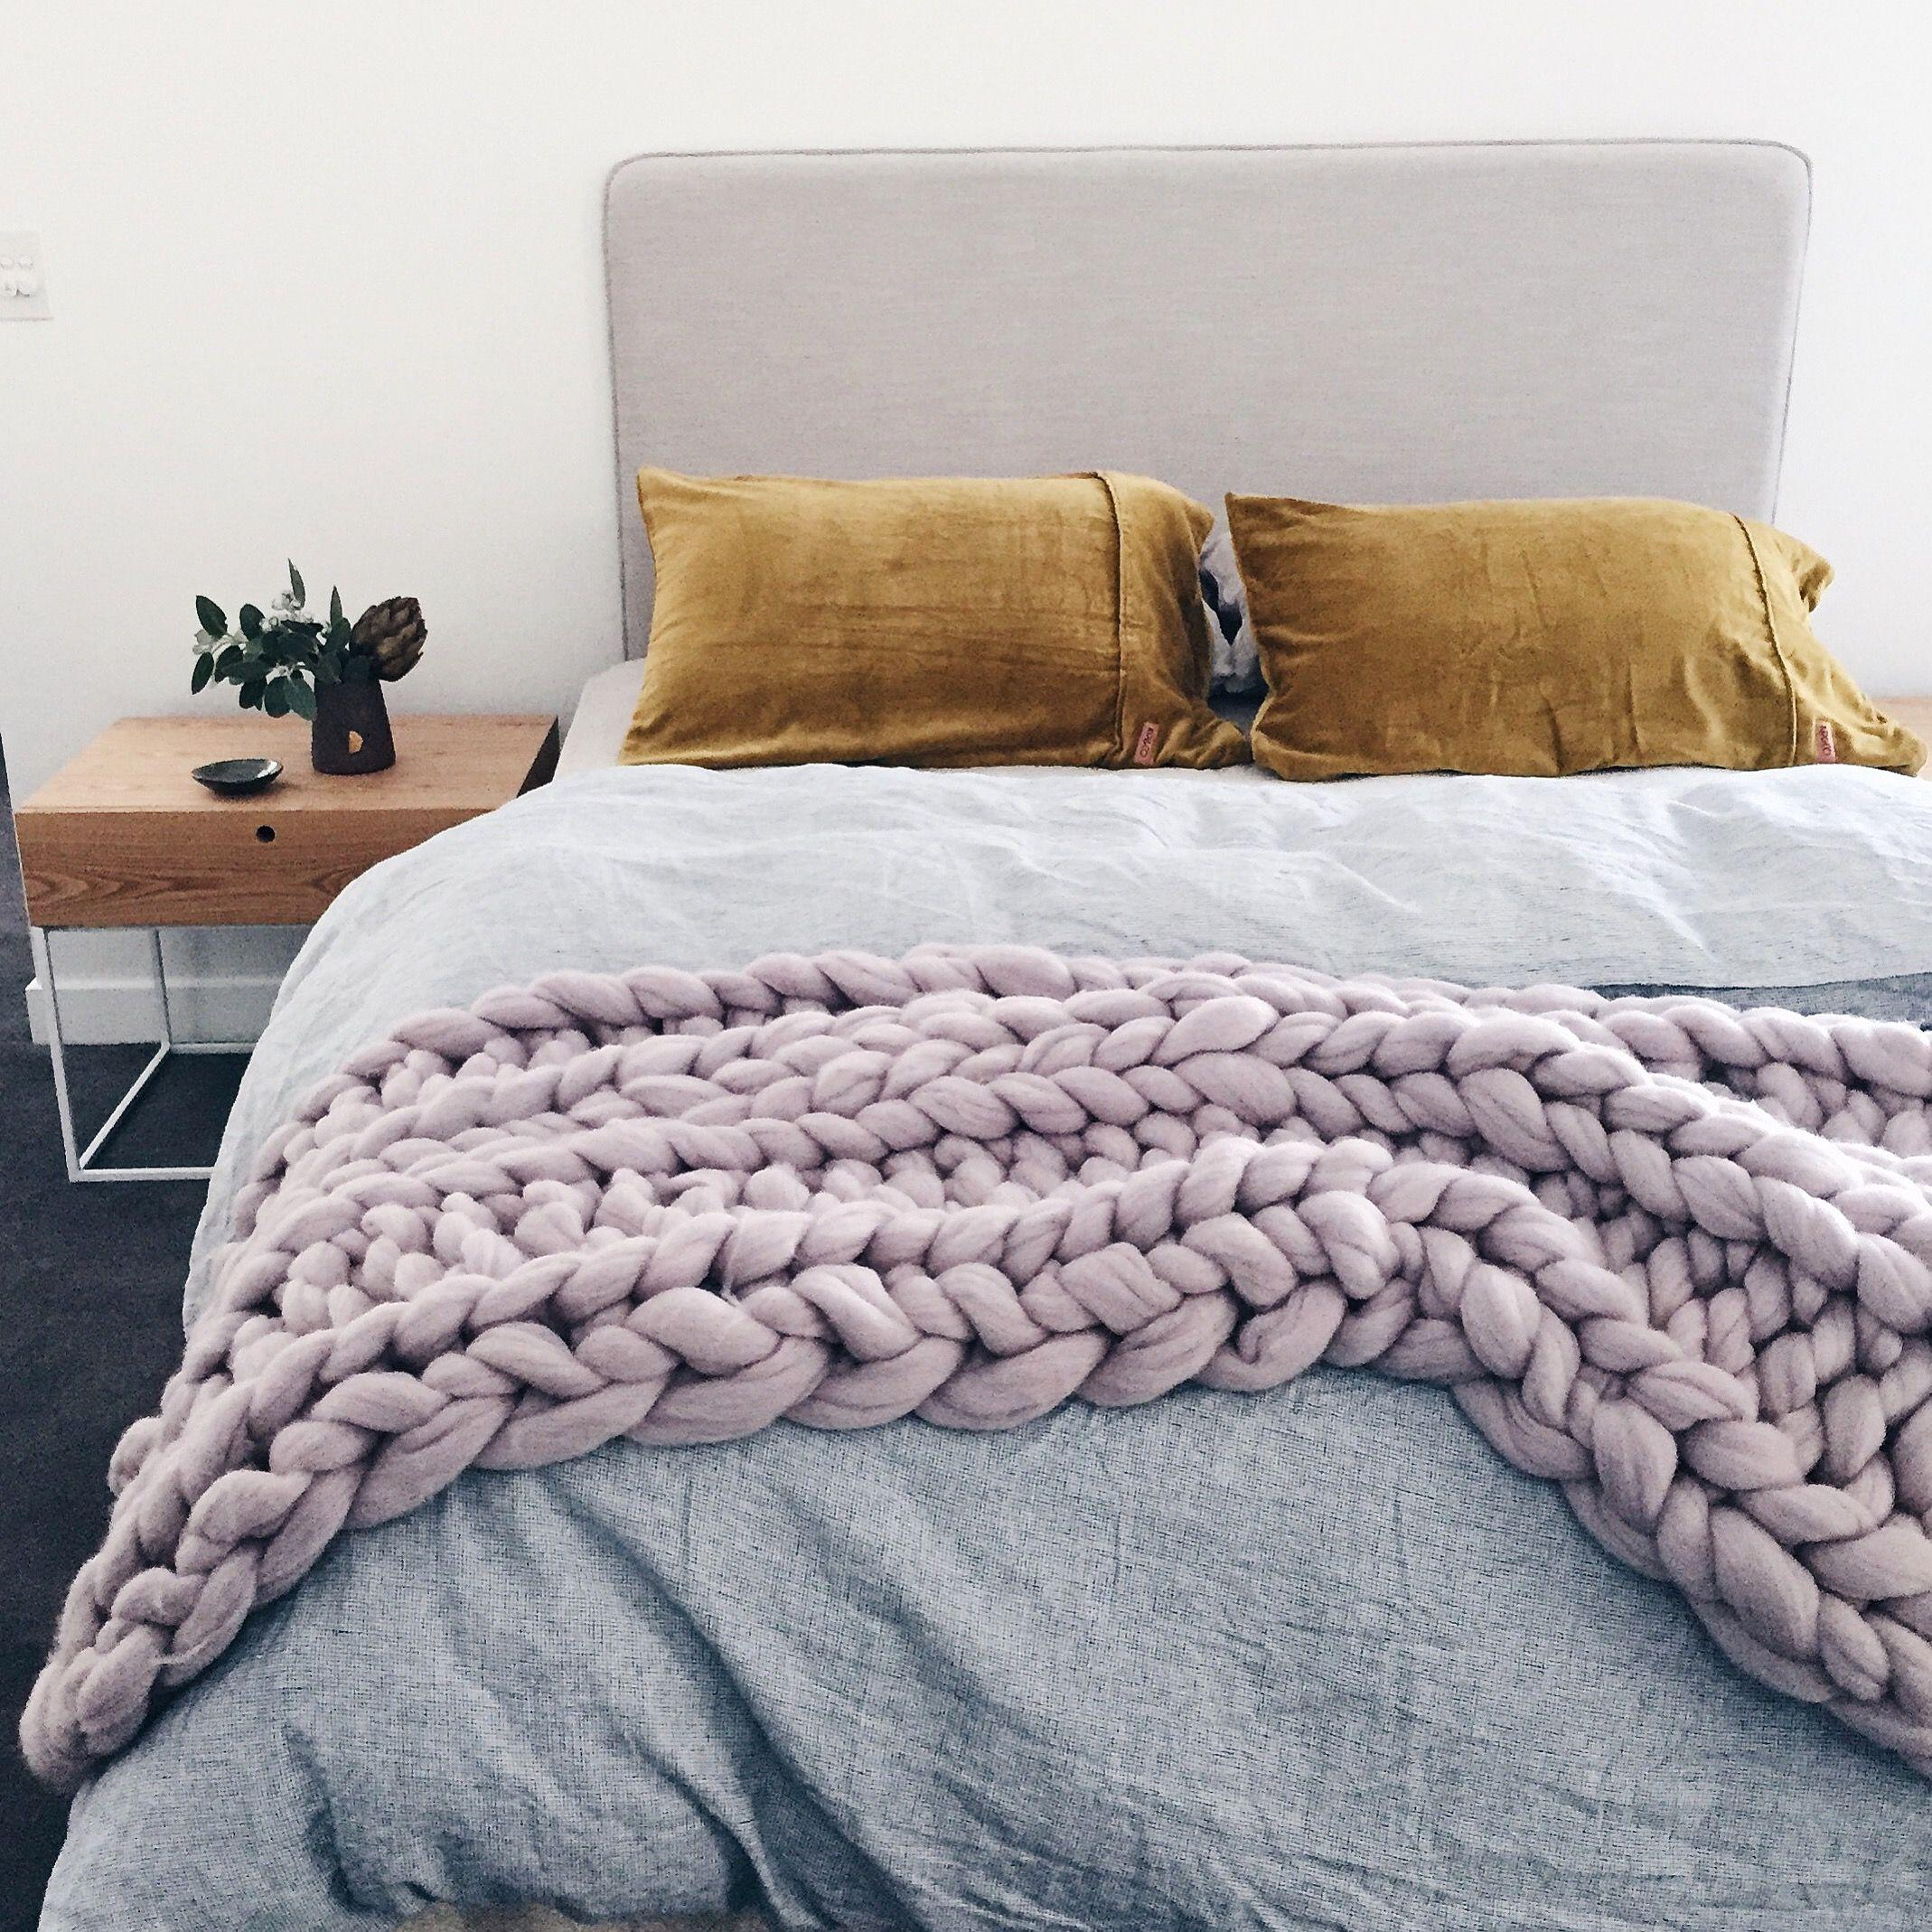 Lilac Chunky Knit Throw Bedroom Ideas Bedroom Decor Room Decor